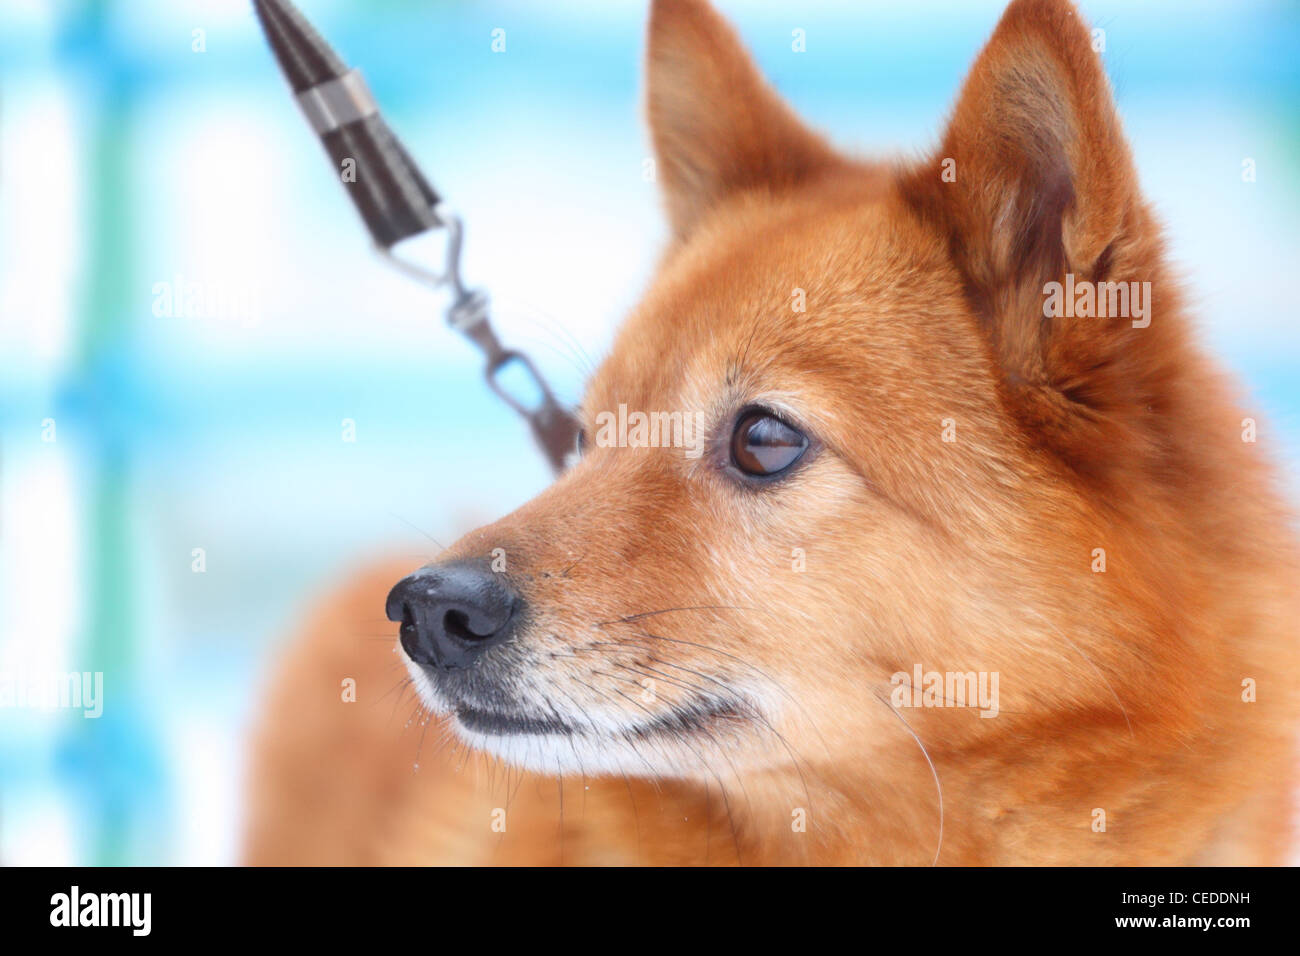 Red dog, karelo-Finnish husky - Stock Image